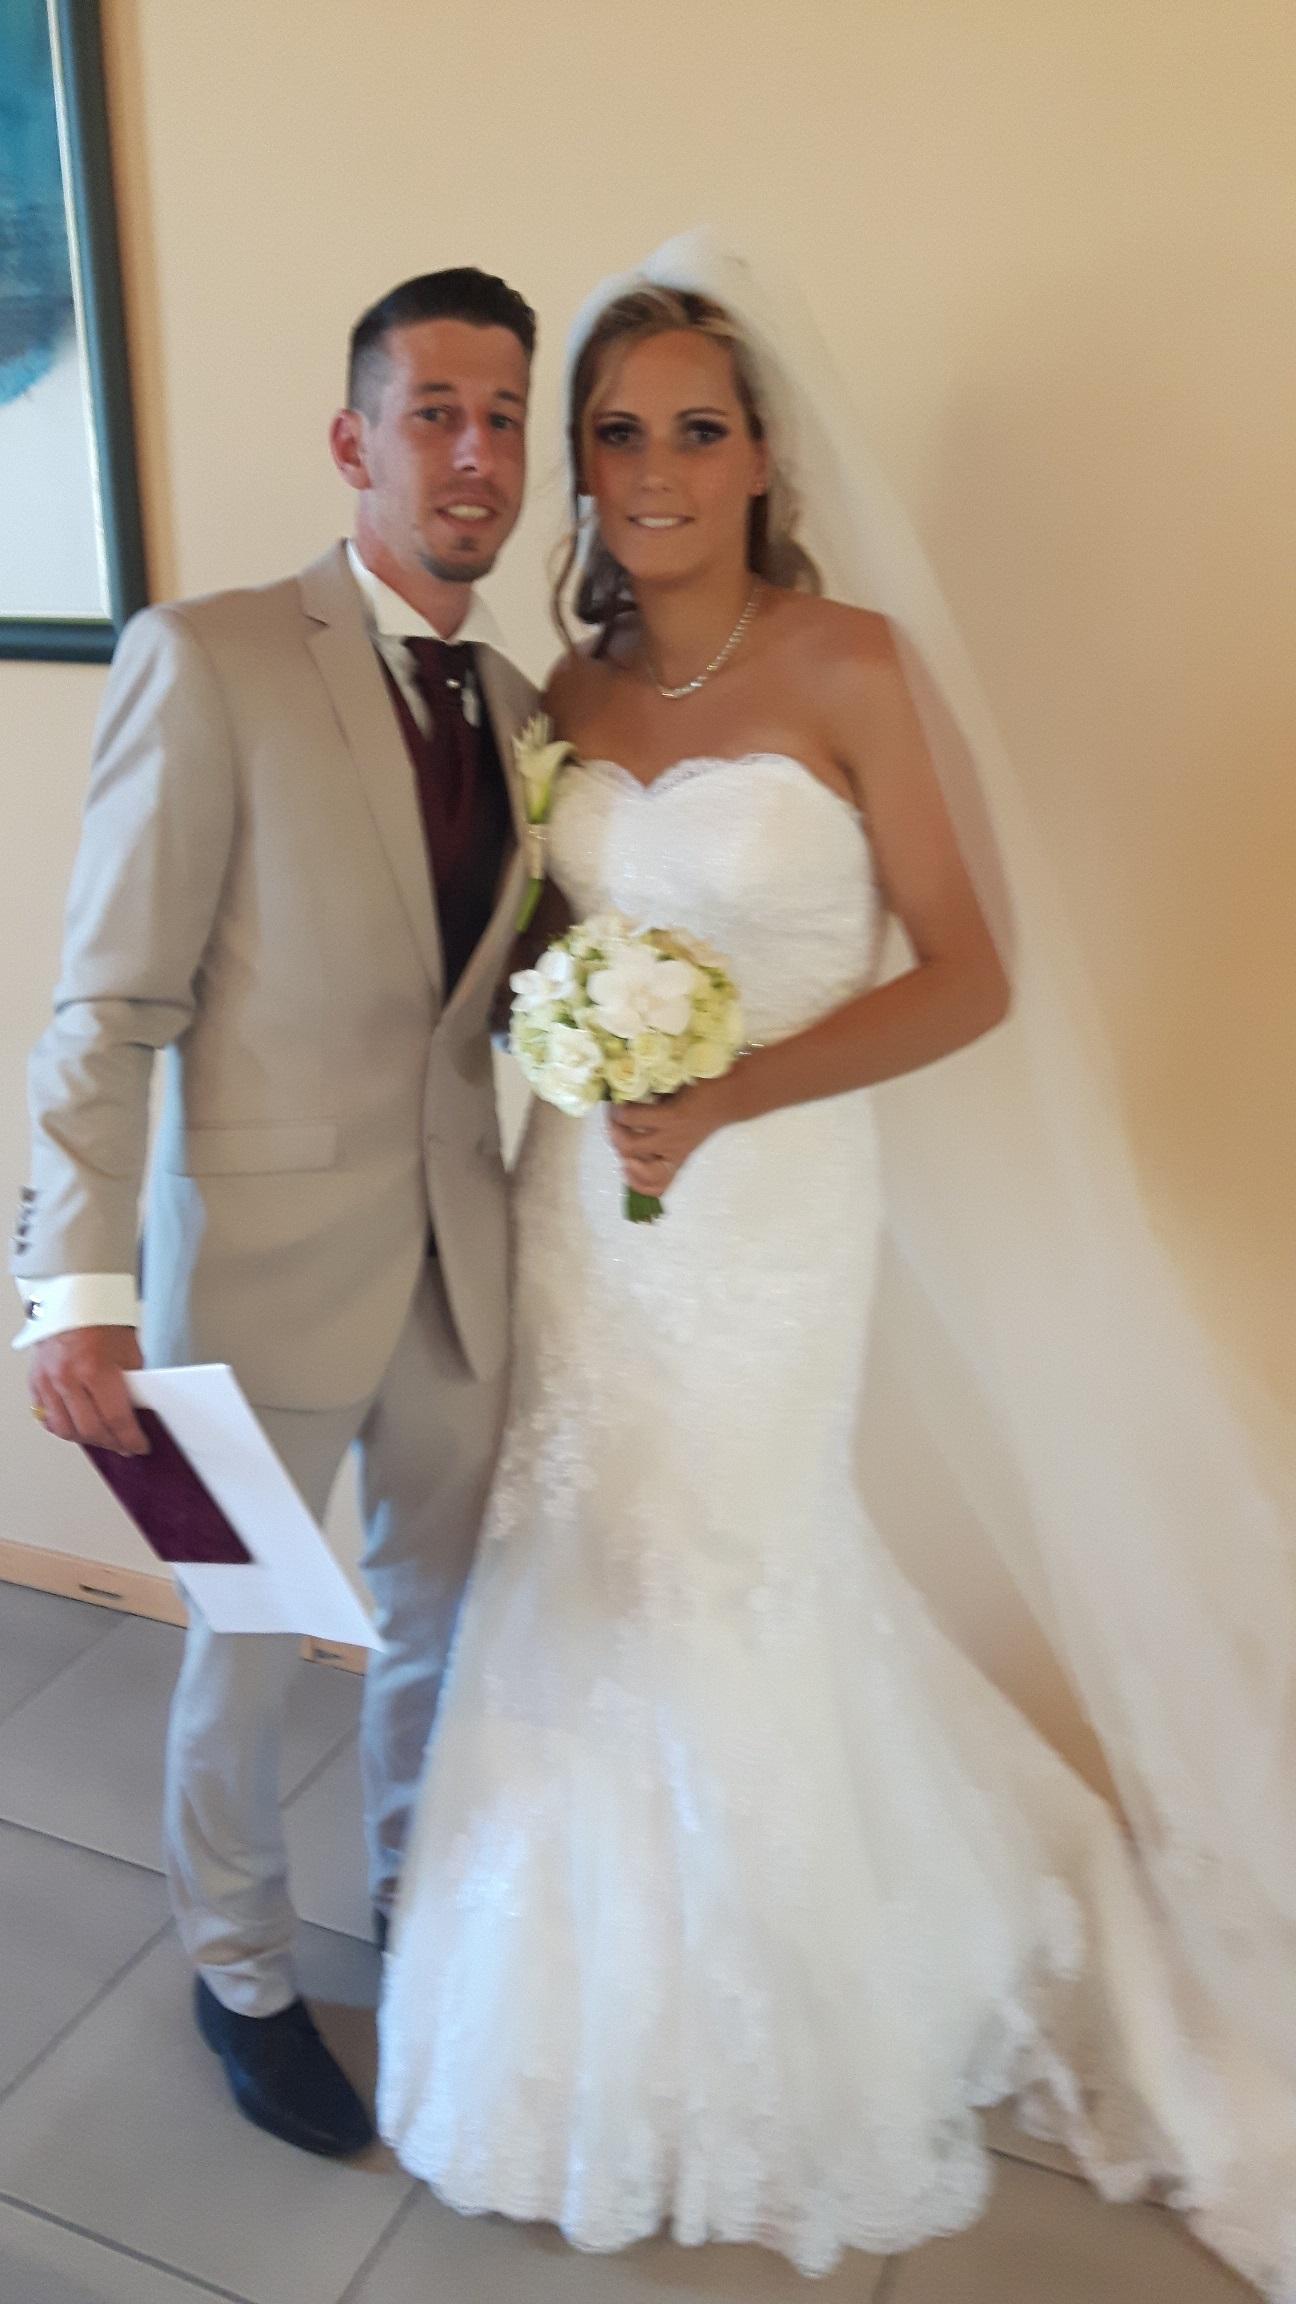 Vincent Hazaer et Livia Lepoint - 27/05/2017